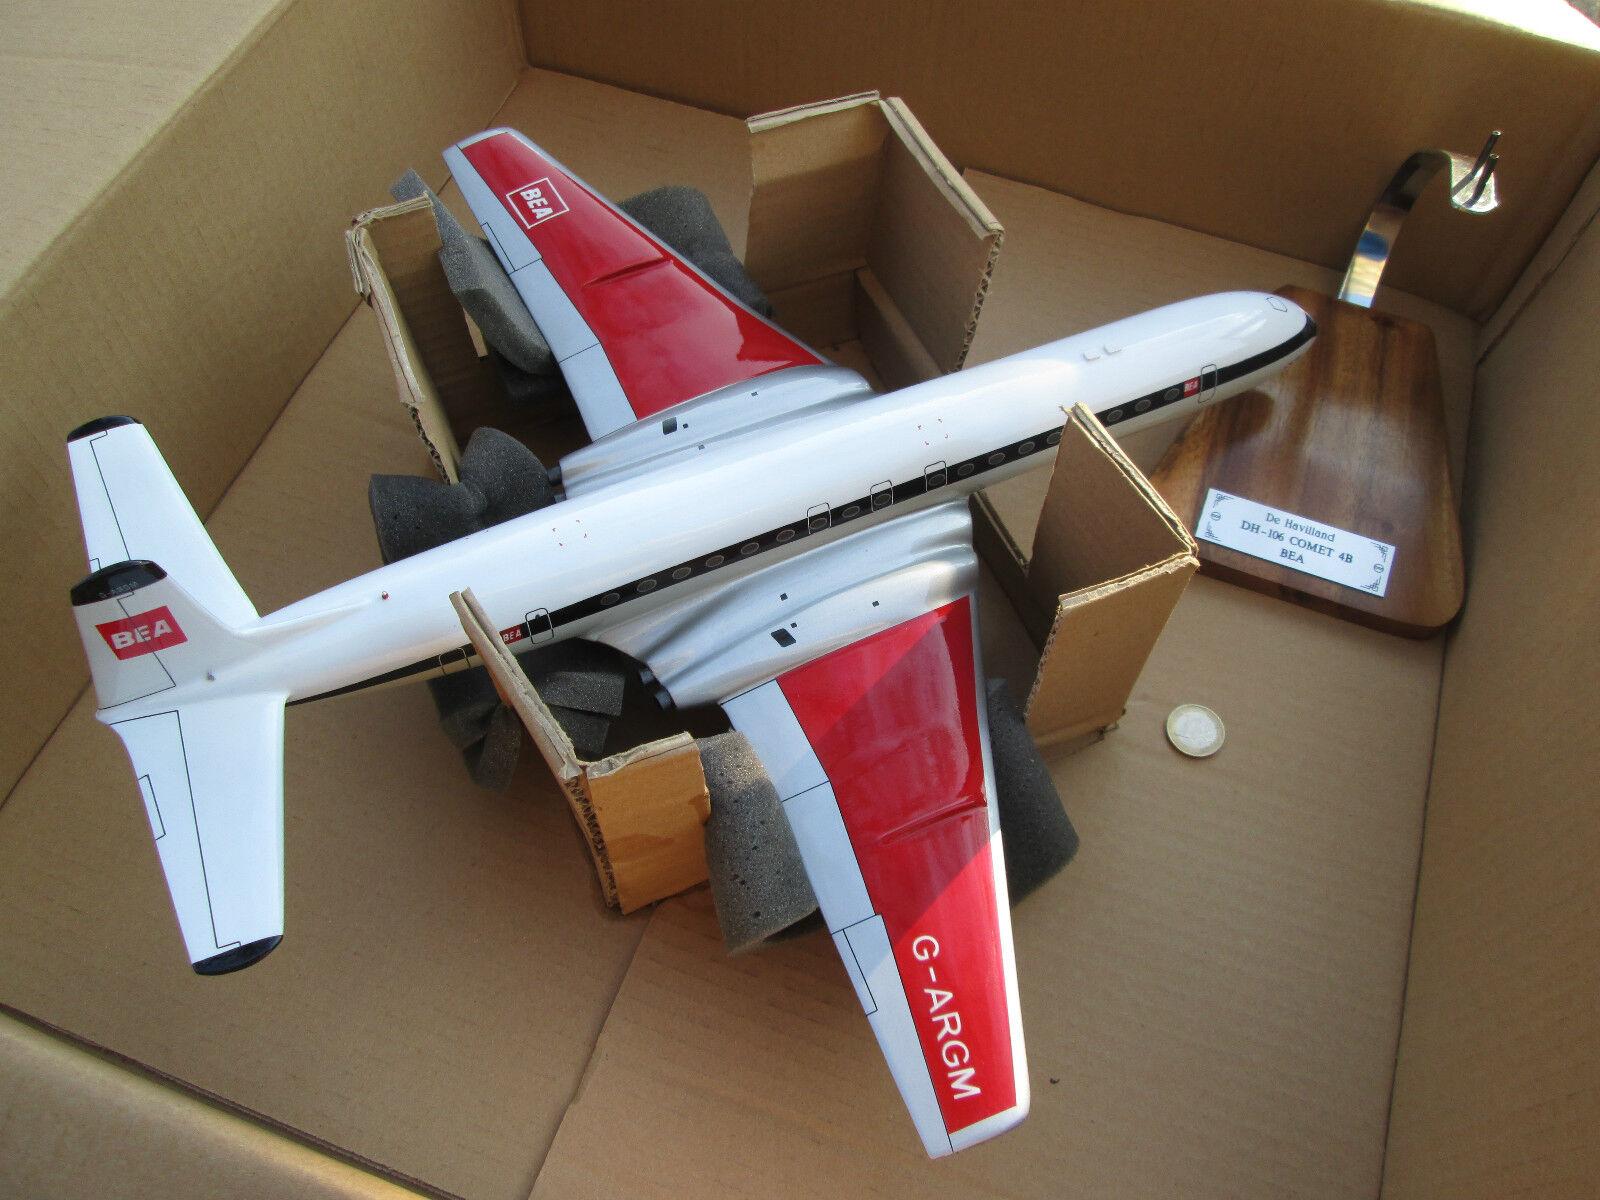 Havilland dh.106 Cometa Enorme 1 72 woodmodel   AVION Aircraft   yakair